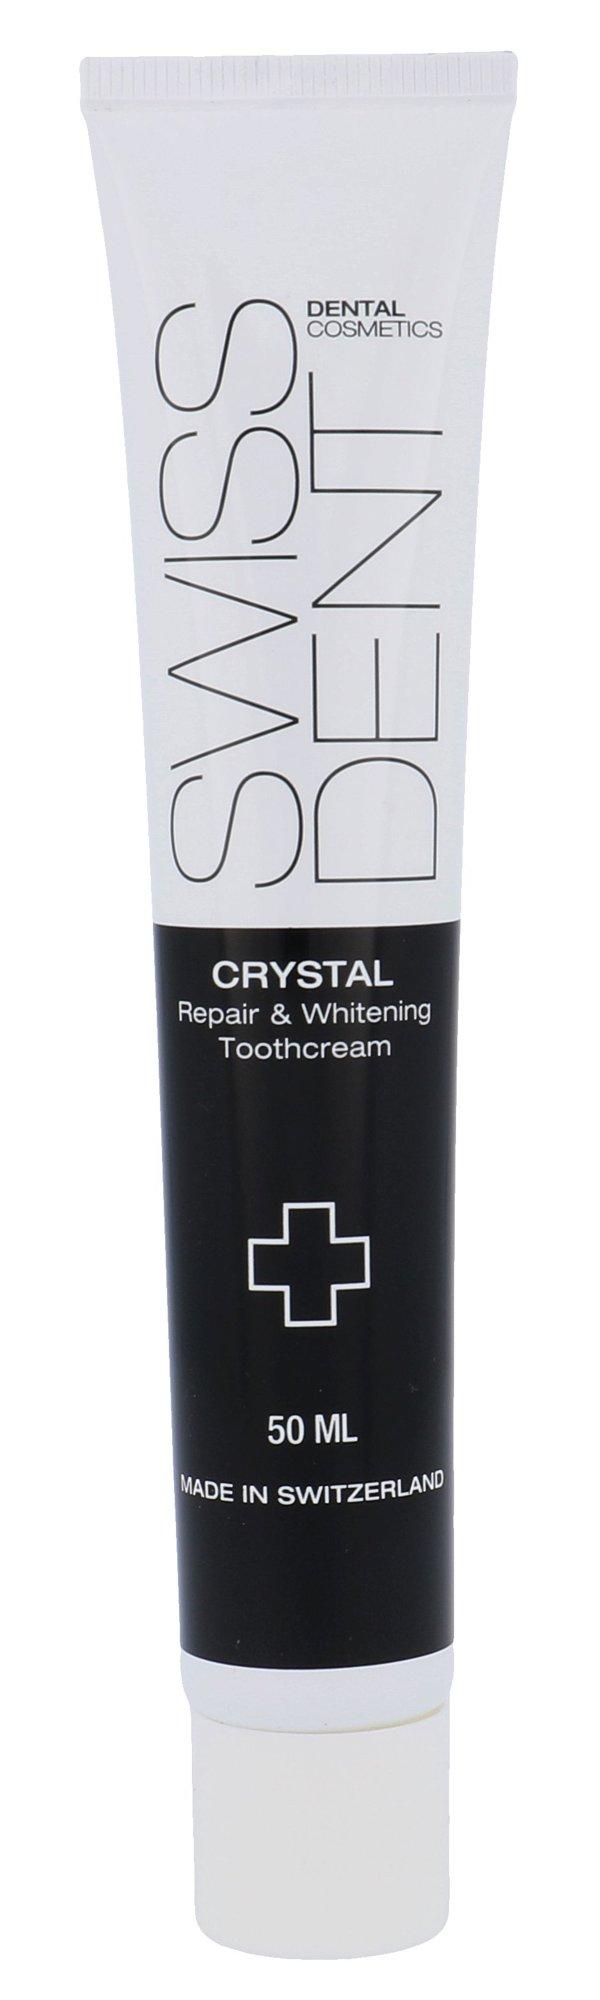 Swissdent Crystal Cosmetic 50ml